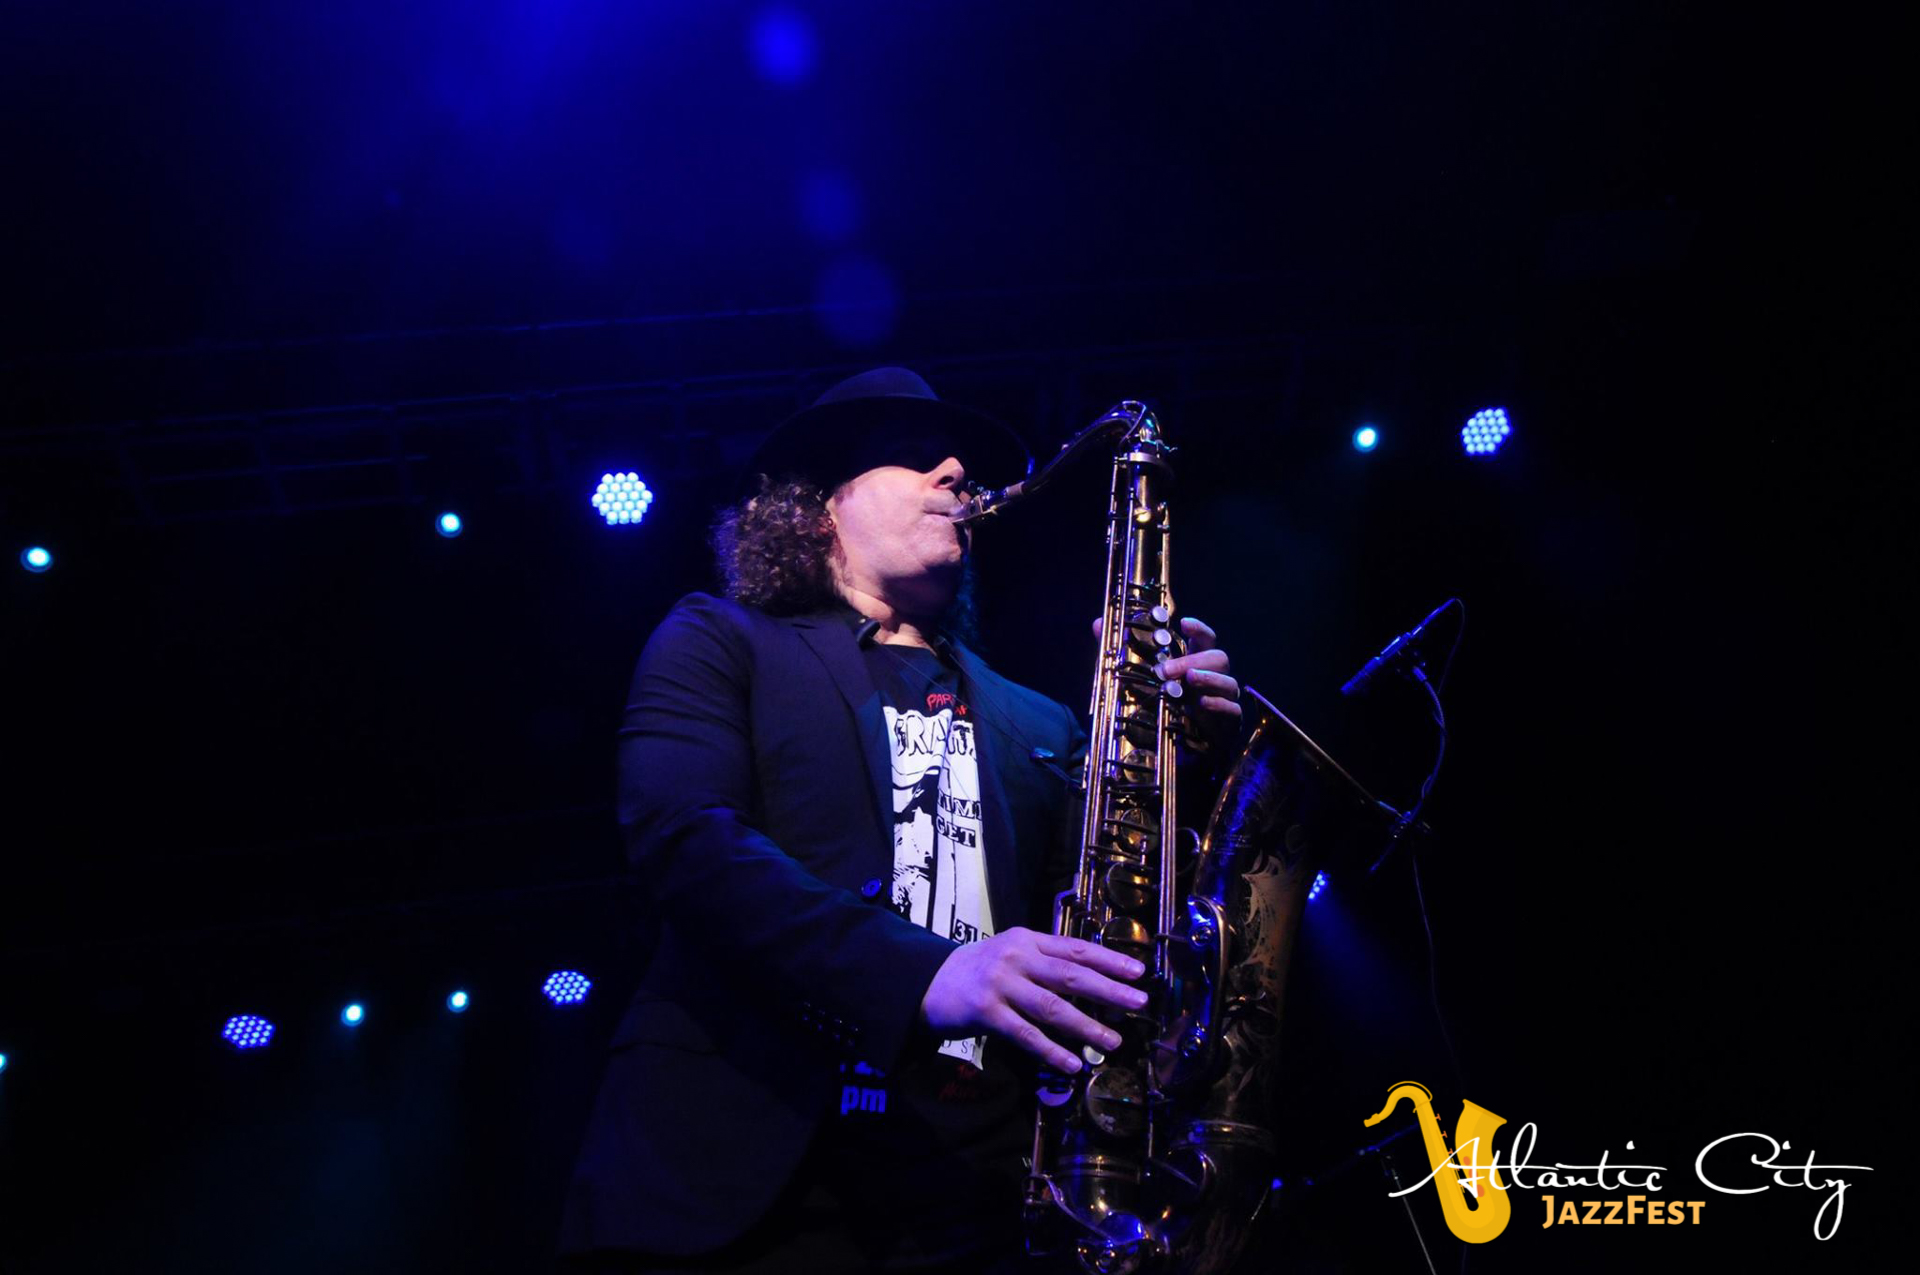 2019 Jazz Fest Picture-73